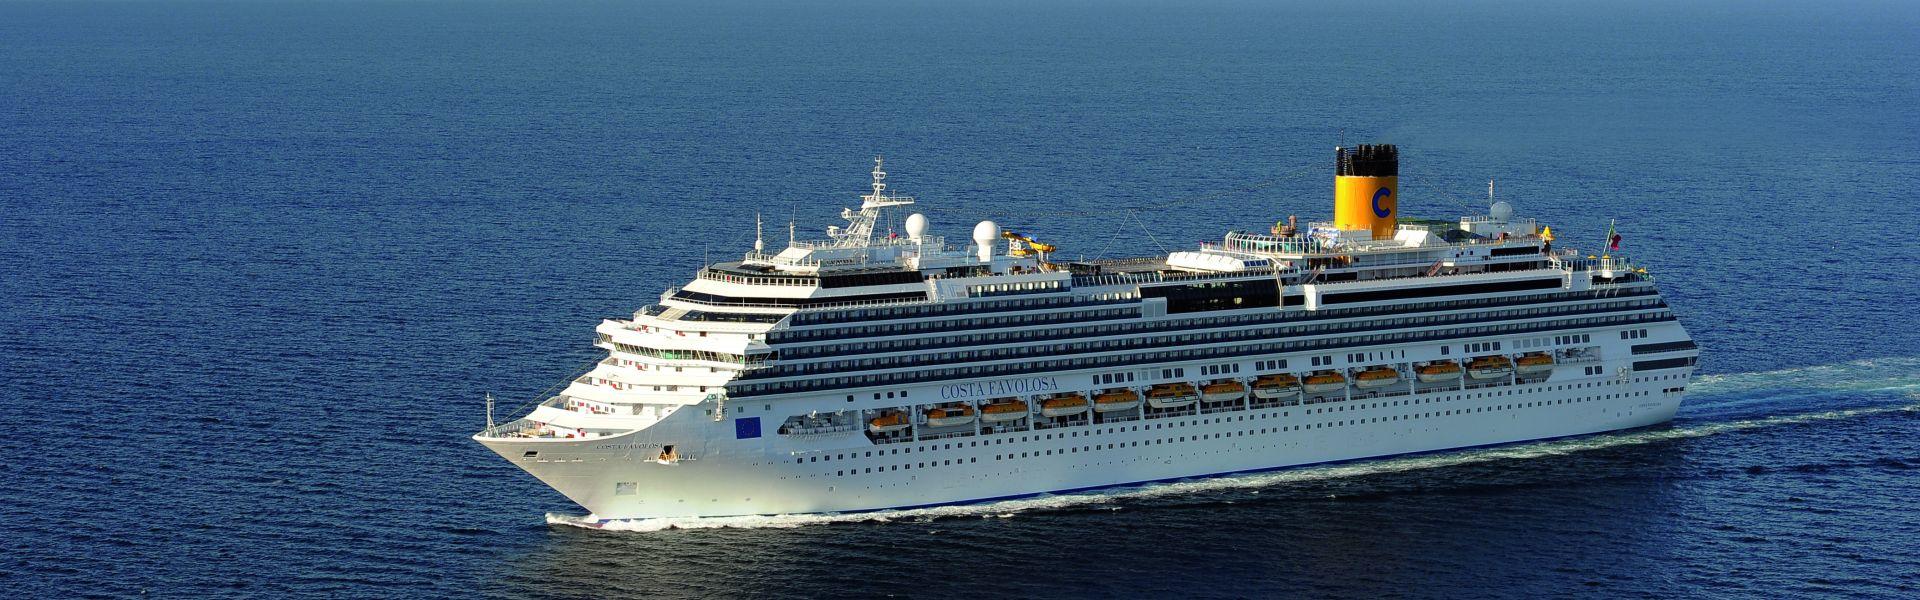 Croaziera 2017 - Mediterana de Vest (Savona) - Costa Cruises - Costa Diadema - 7 nopti